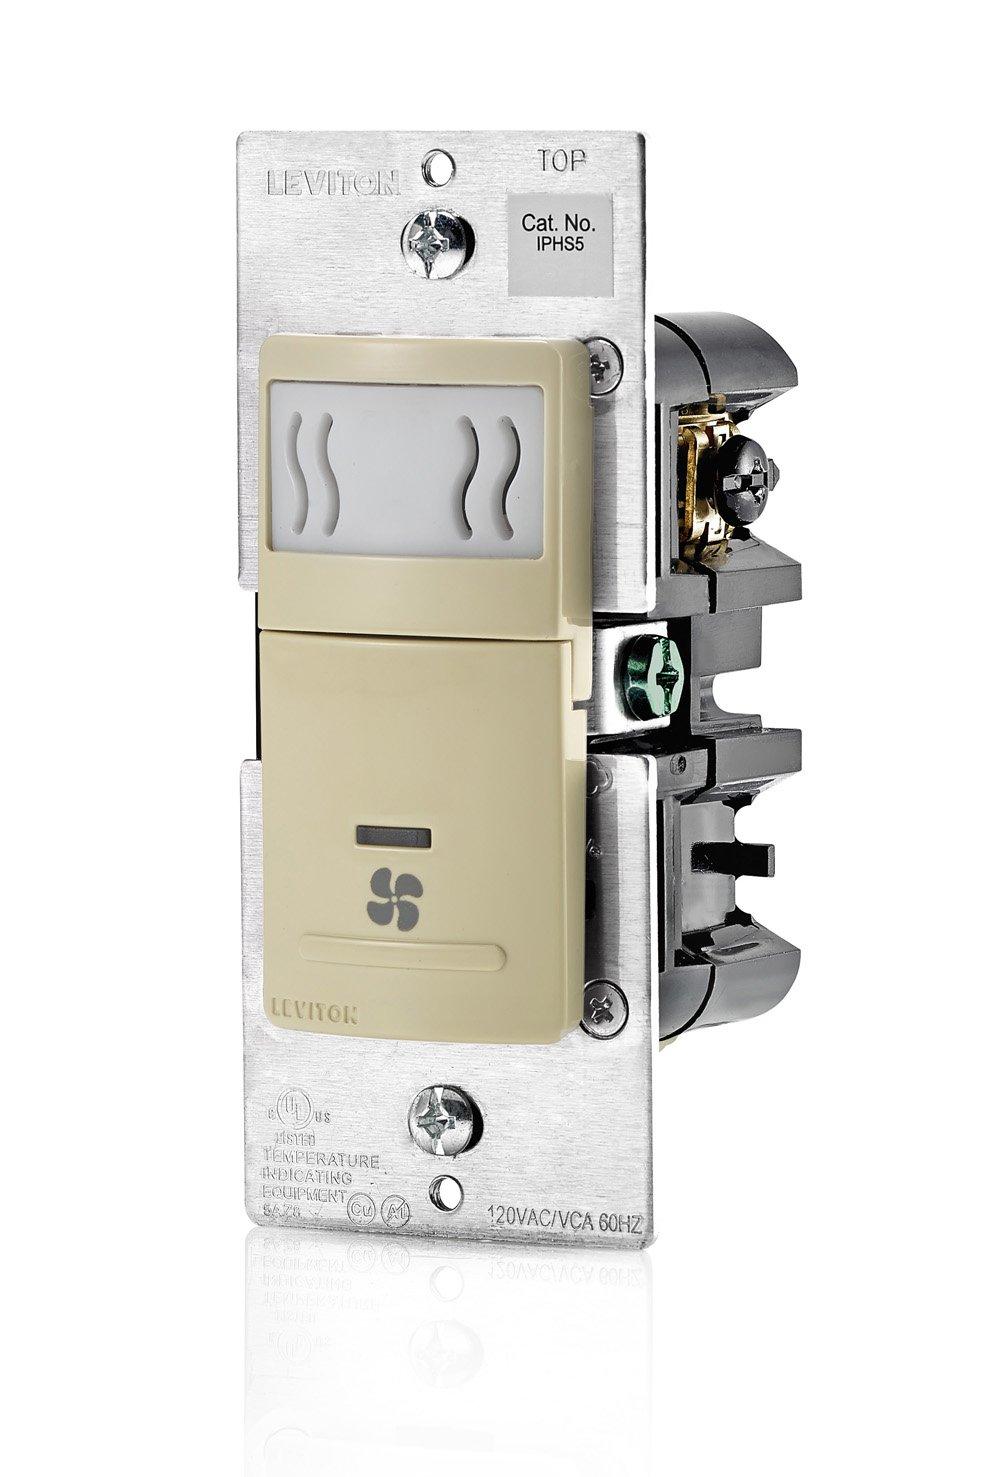 Leviton IPHS5-1LI Decora In-Wall Humidity Sensor /& Fan Control 3A Single Pole Ivory